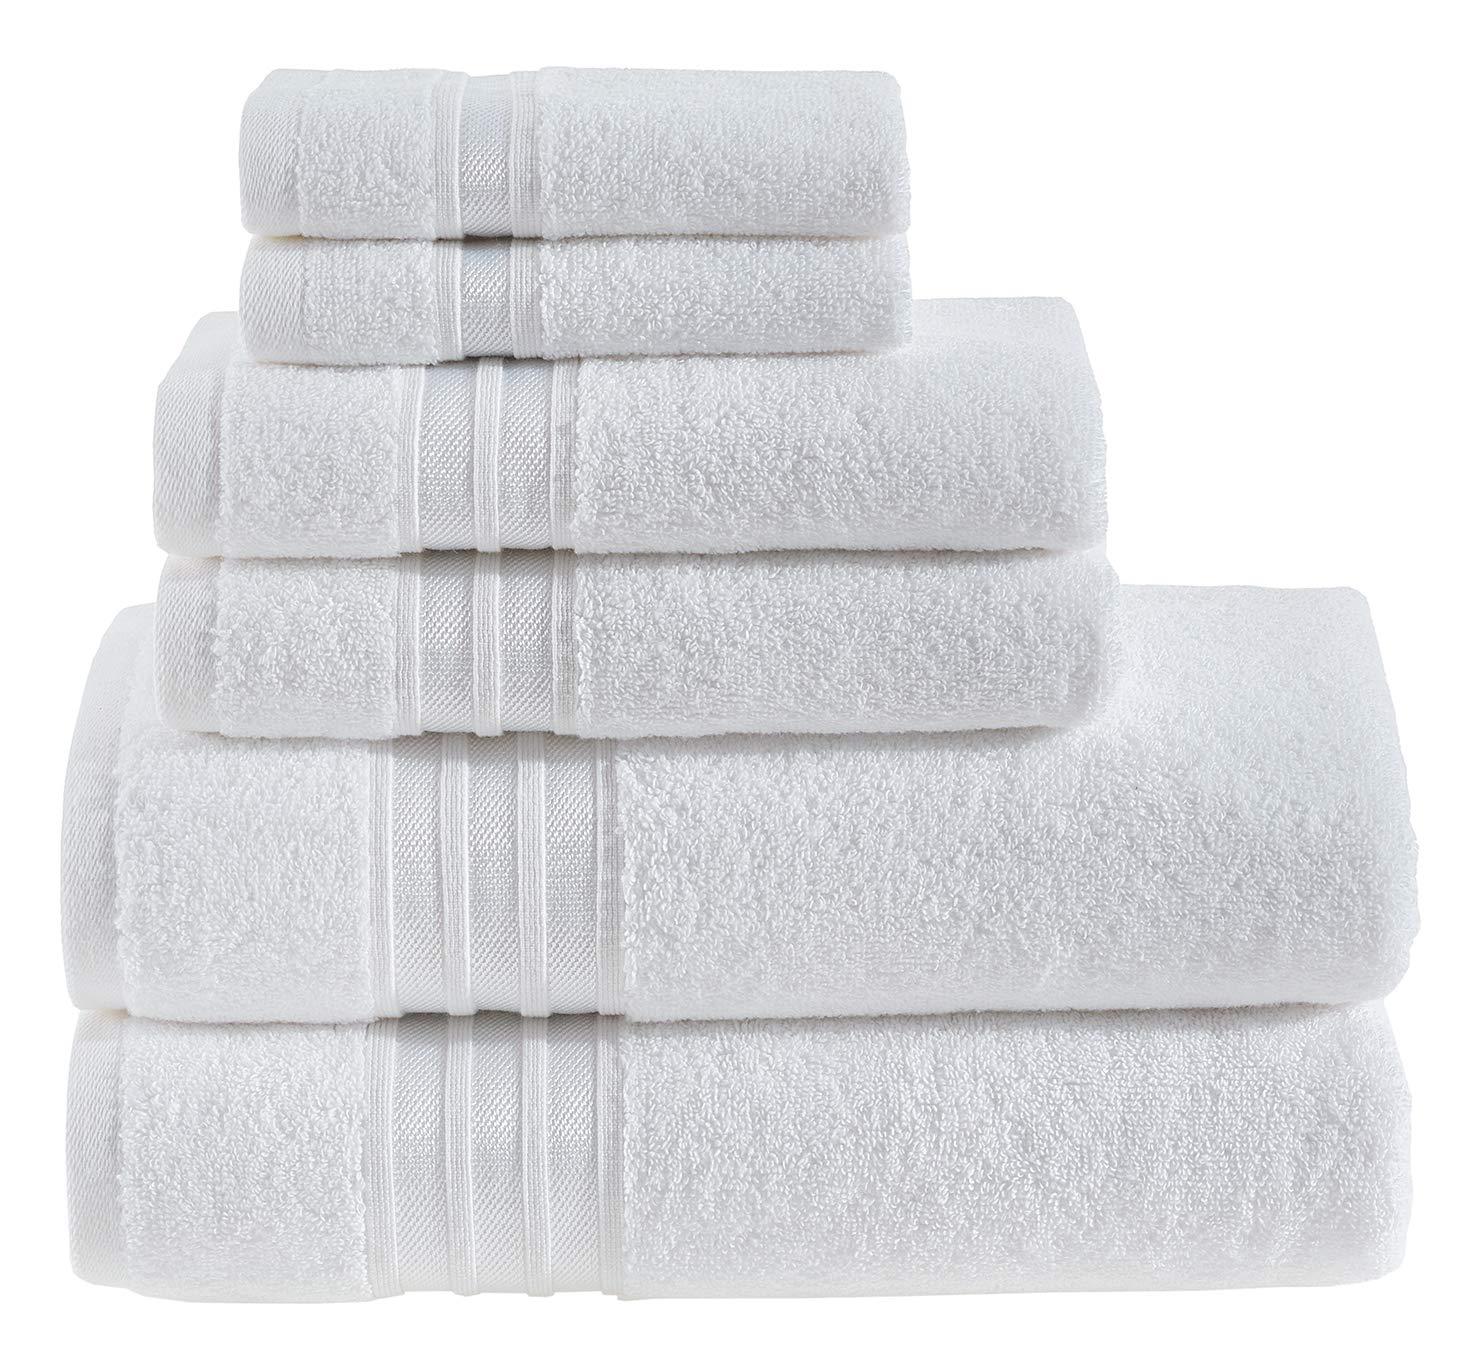 Hammam Linen Luxury White Bath Towel Set - Combed Cotton Hotel Quality Absorbent- 6 Pieces Towel Set - 100% Cotton Towels - 2 Large Bath Towels 27x54, 2 Hand Towels 16x28, 2 Wash Cloths 12x12